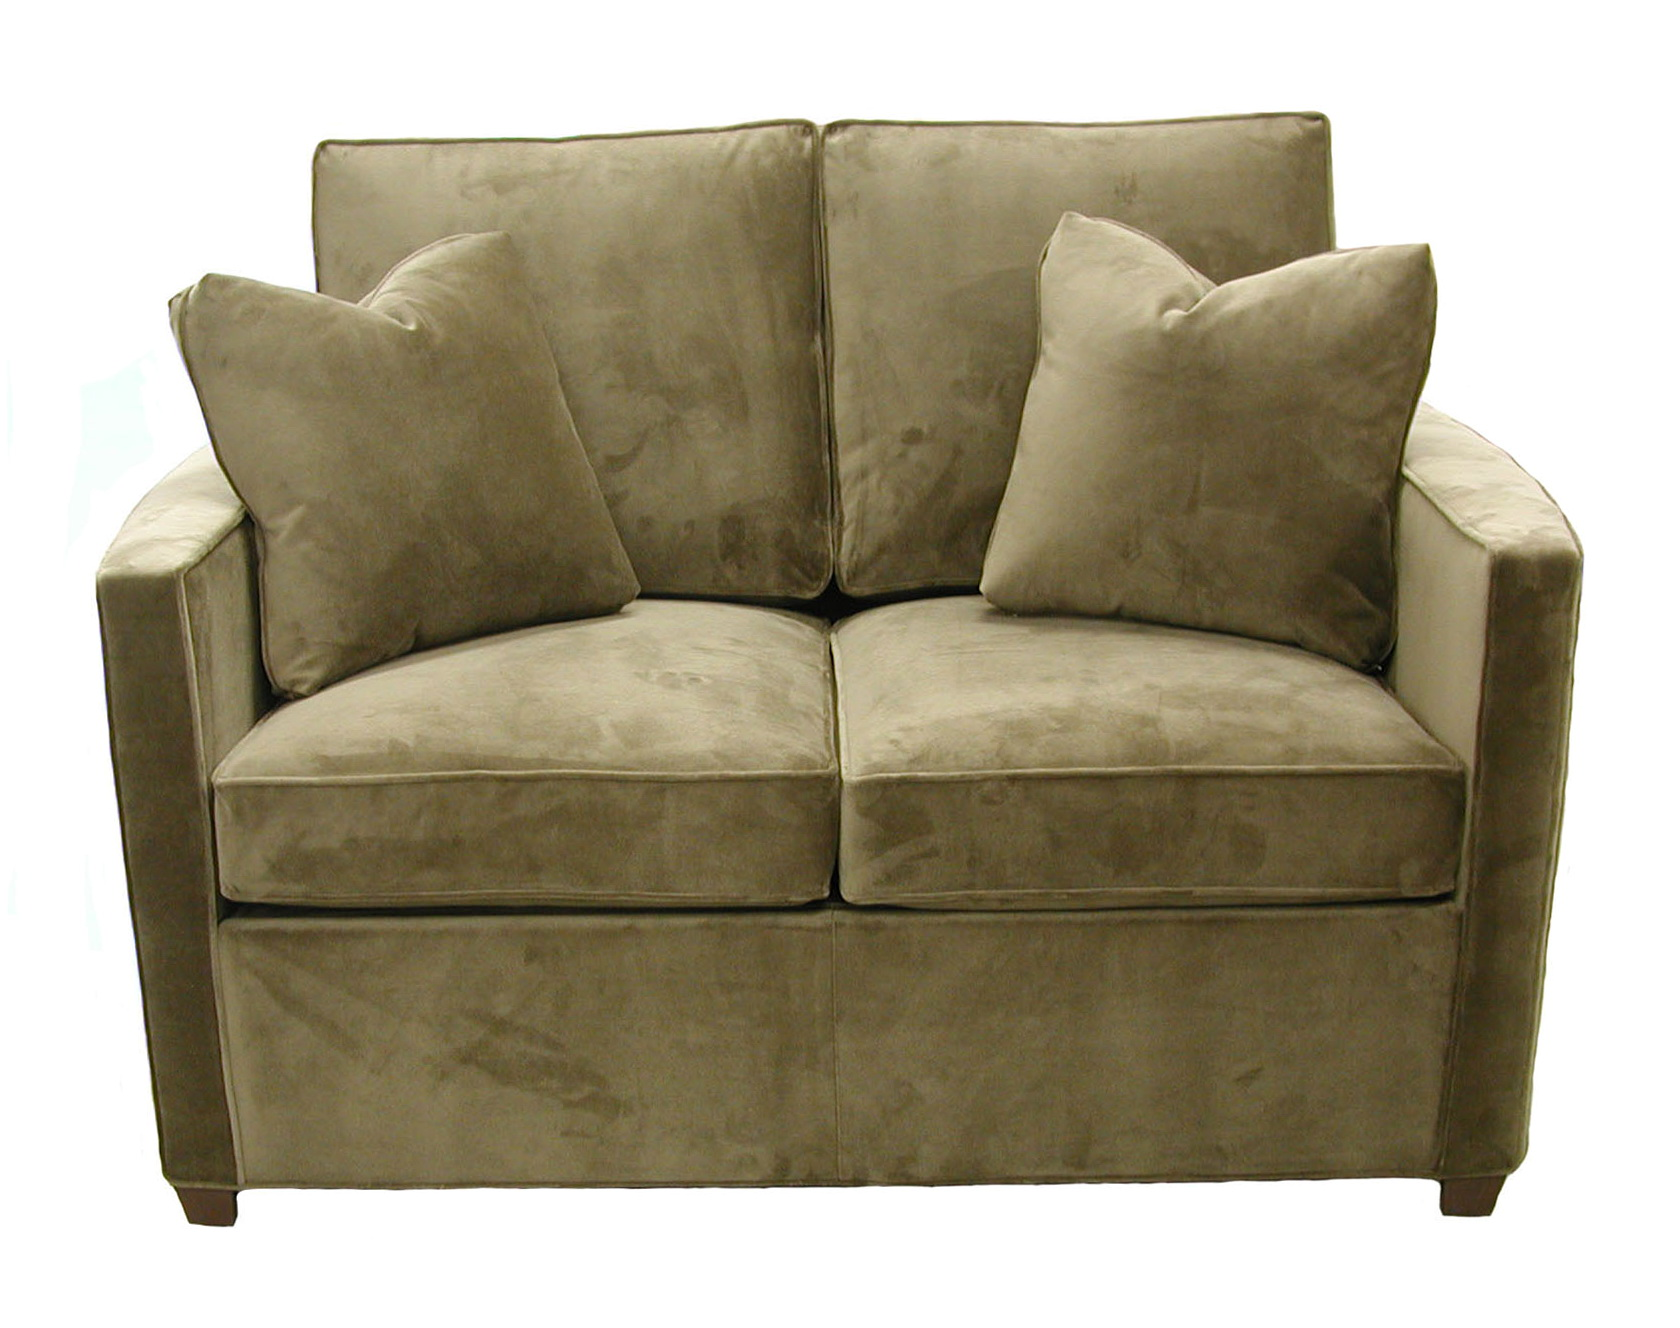 Twin Sleeper Sofa Chair